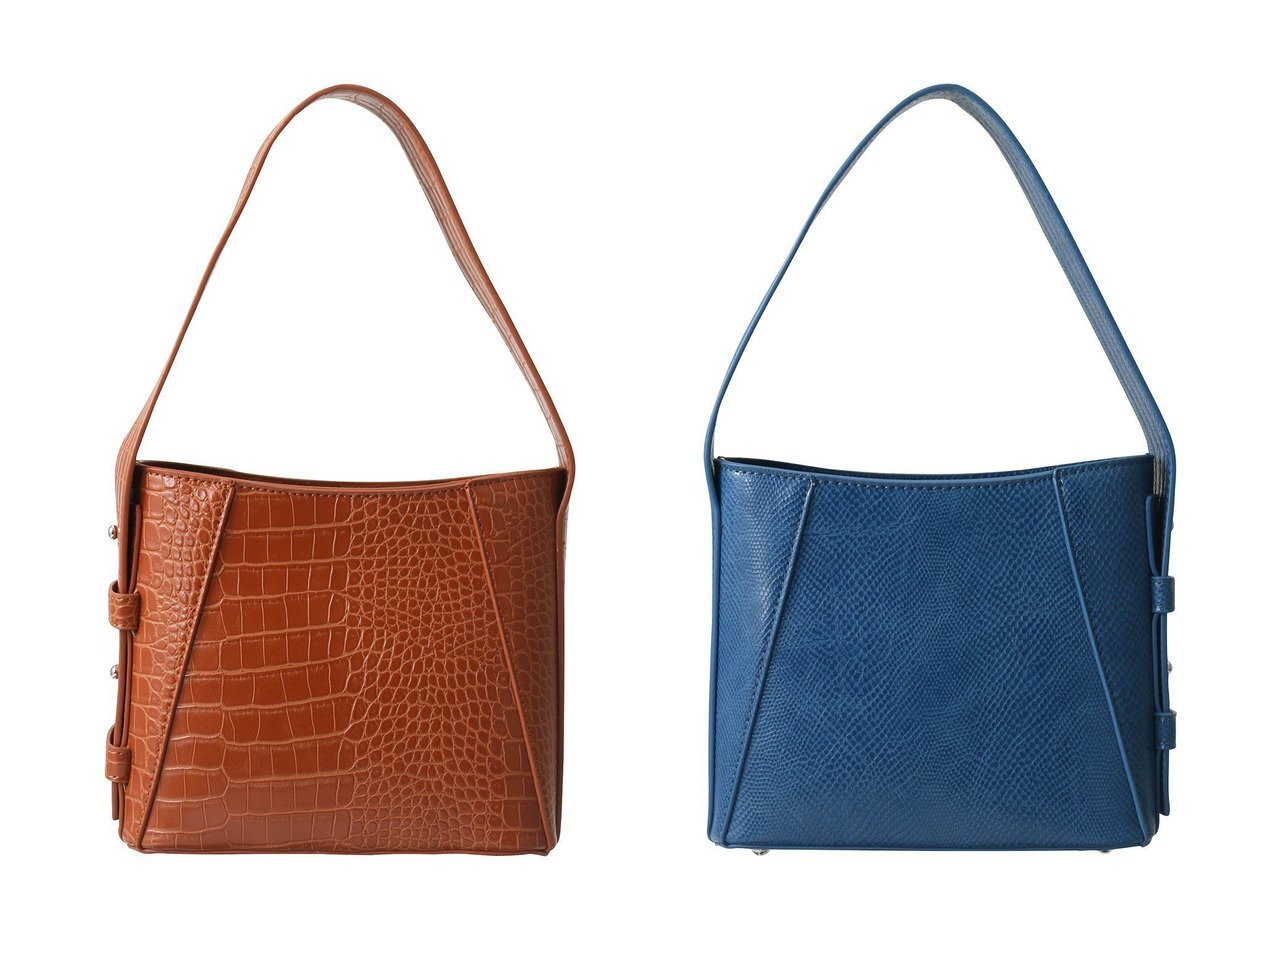 【HVISK/ヴィスク】のBRINY SMALL MATTE CROCO ハンドバッグ&BRINY SMALL SNAKE ハンドバッグ 【バッグ・鞄】おすすめ!人気、トレンド・レディースファッションの通販 おすすめで人気の流行・トレンド、ファッションの通販商品 インテリア・家具・メンズファッション・キッズファッション・レディースファッション・服の通販 founy(ファニー) https://founy.com/ ファッション Fashion レディースファッション WOMEN バッグ Bag クロコ ハンドバッグ  ID:crp329100000070715